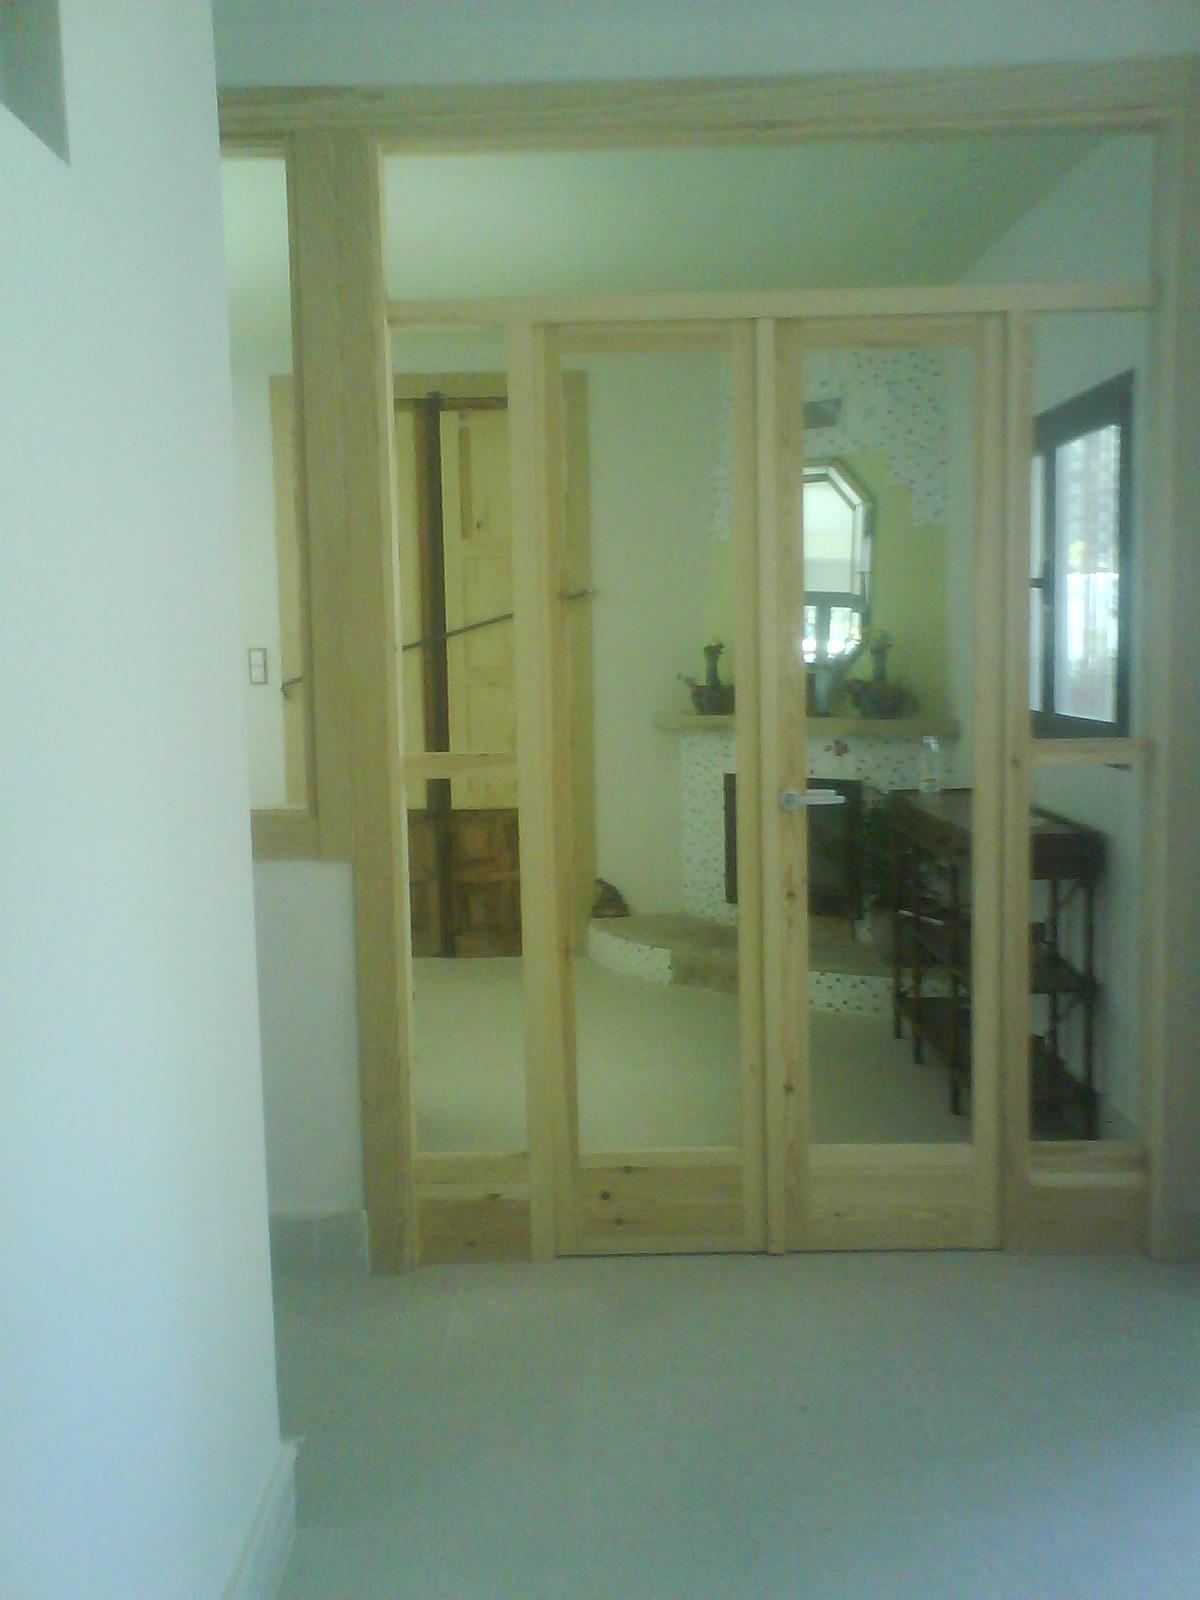 Carpinter a baena puertas de madera for Muebles baena